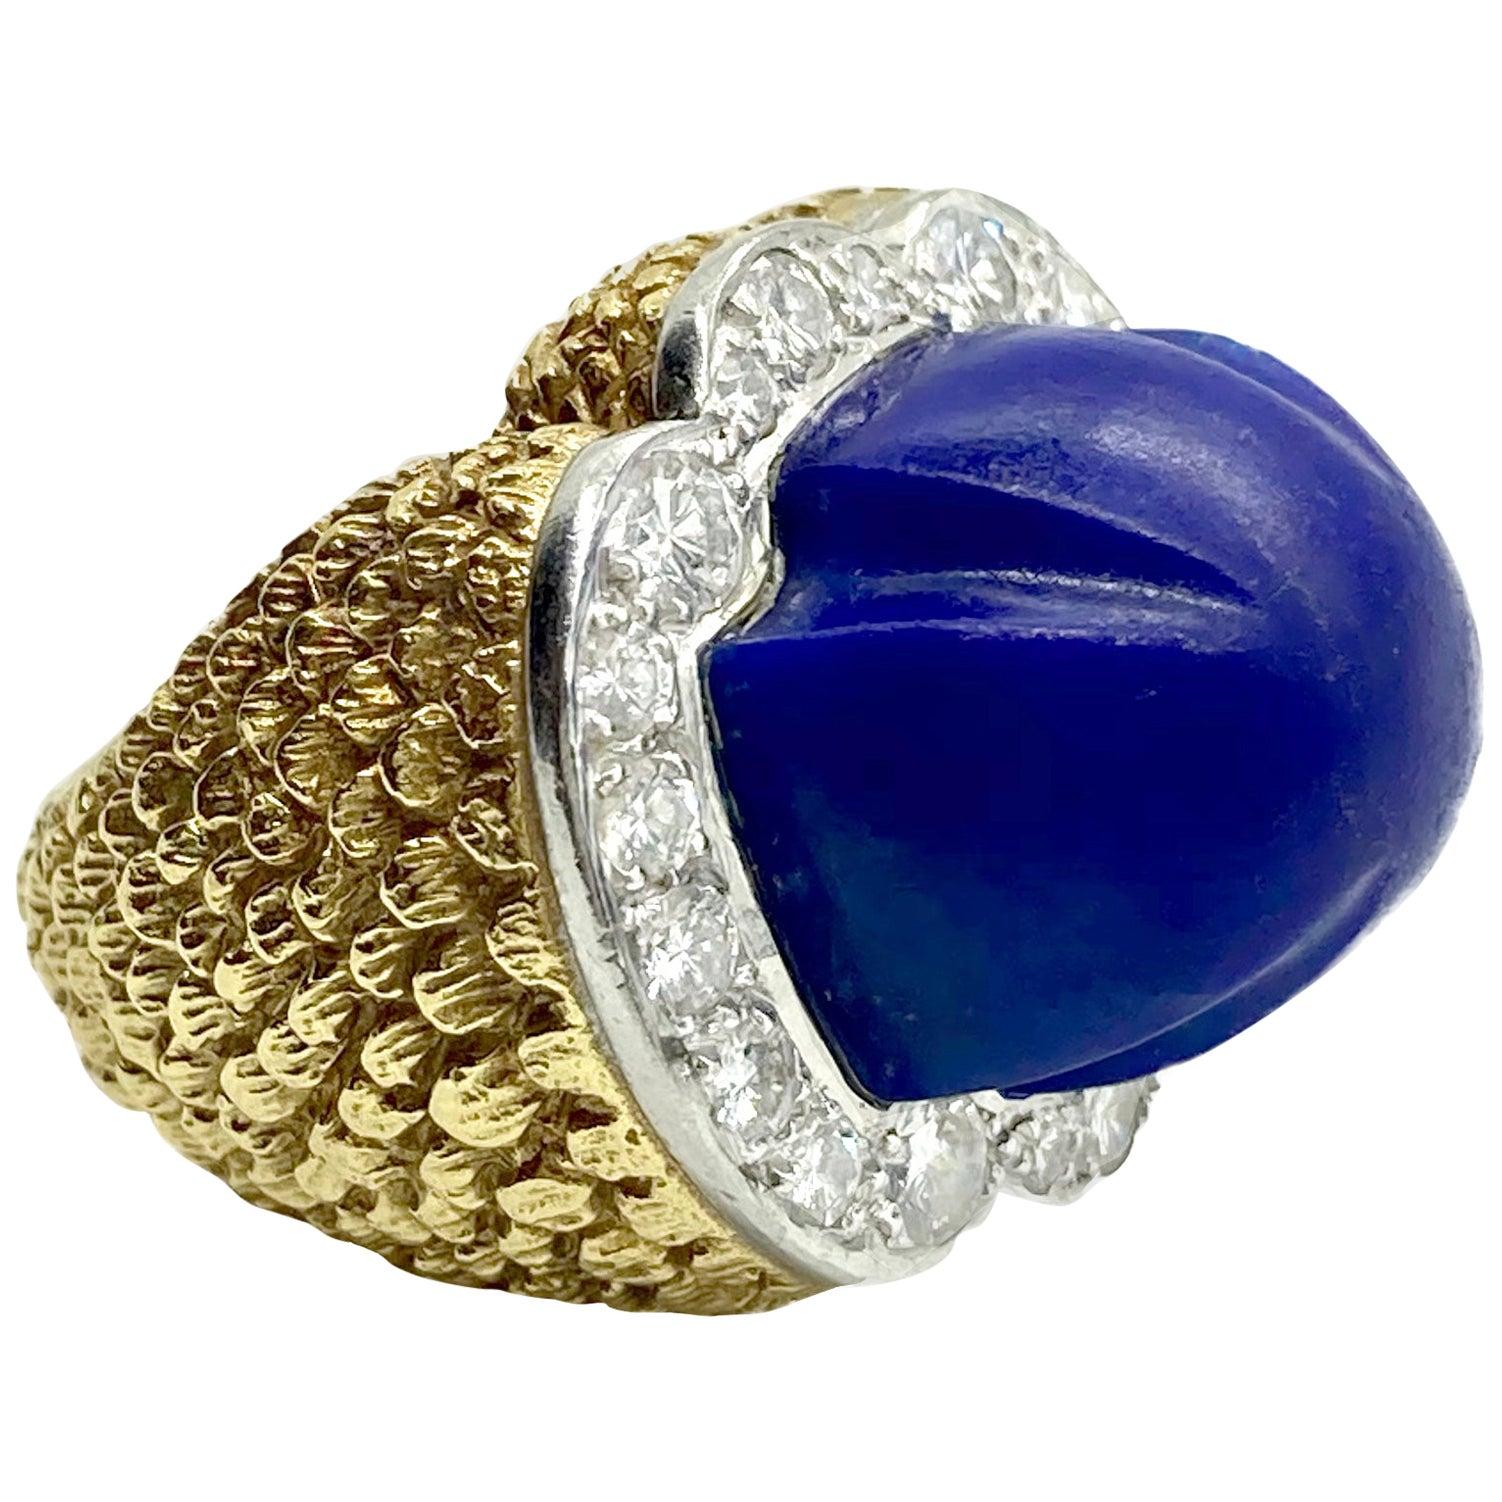 Lapis Lazuli and Diamond Textured Yellow Gold Dome Ring